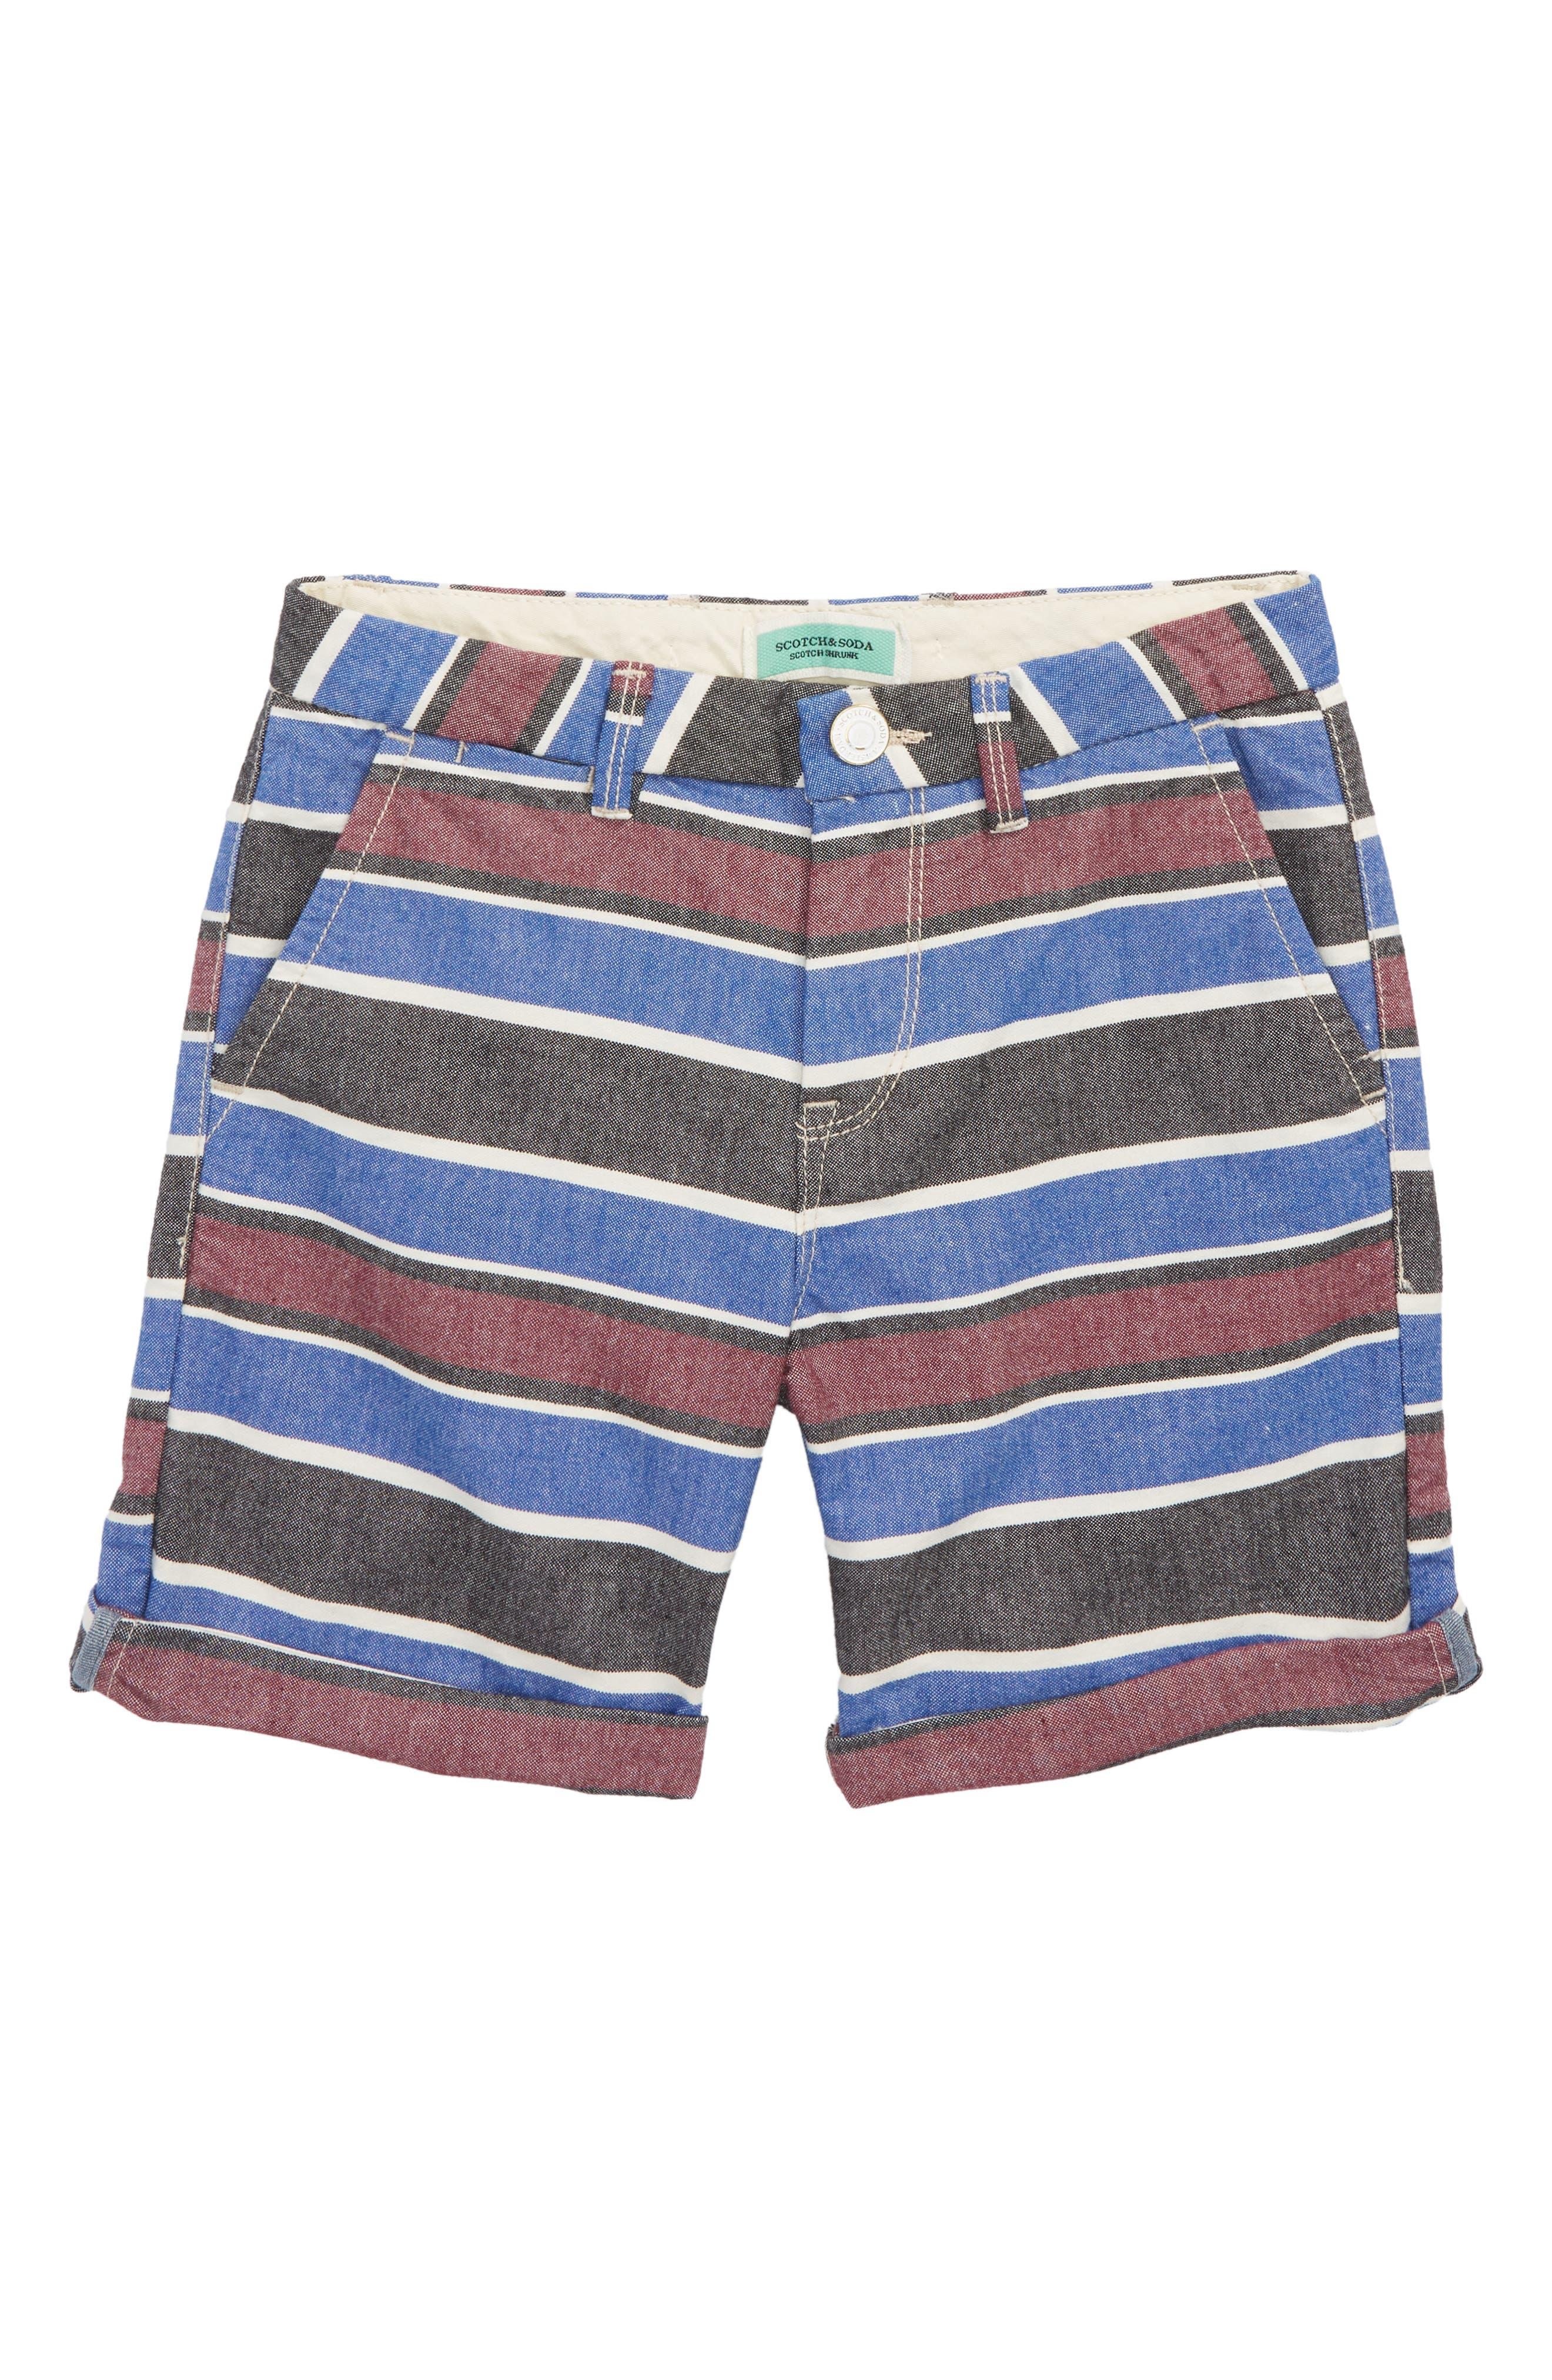 Stripe Chino Shorts,                         Main,                         color, Combo Stripes